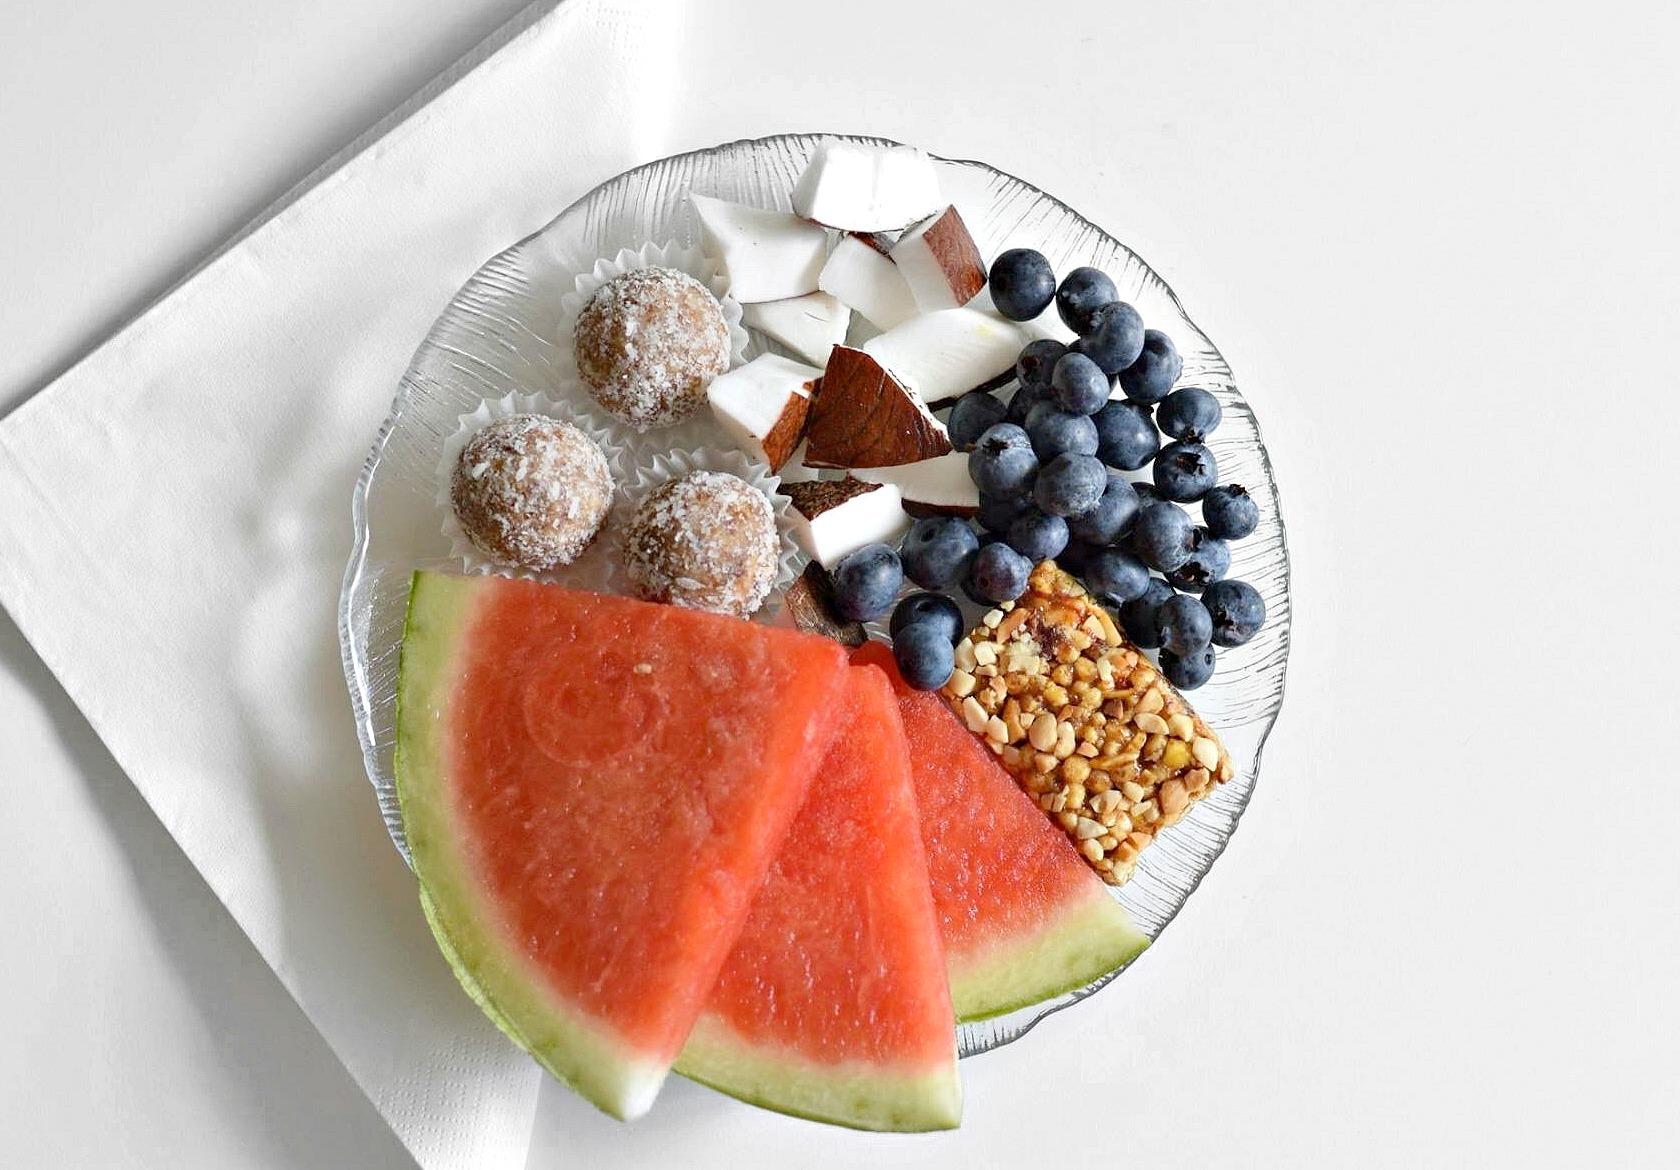 klara-fuchs-juice-plus-gesunde-snacks-fitnessblog-fitness-blogger-blog-österreich-sport-gesundheit-1